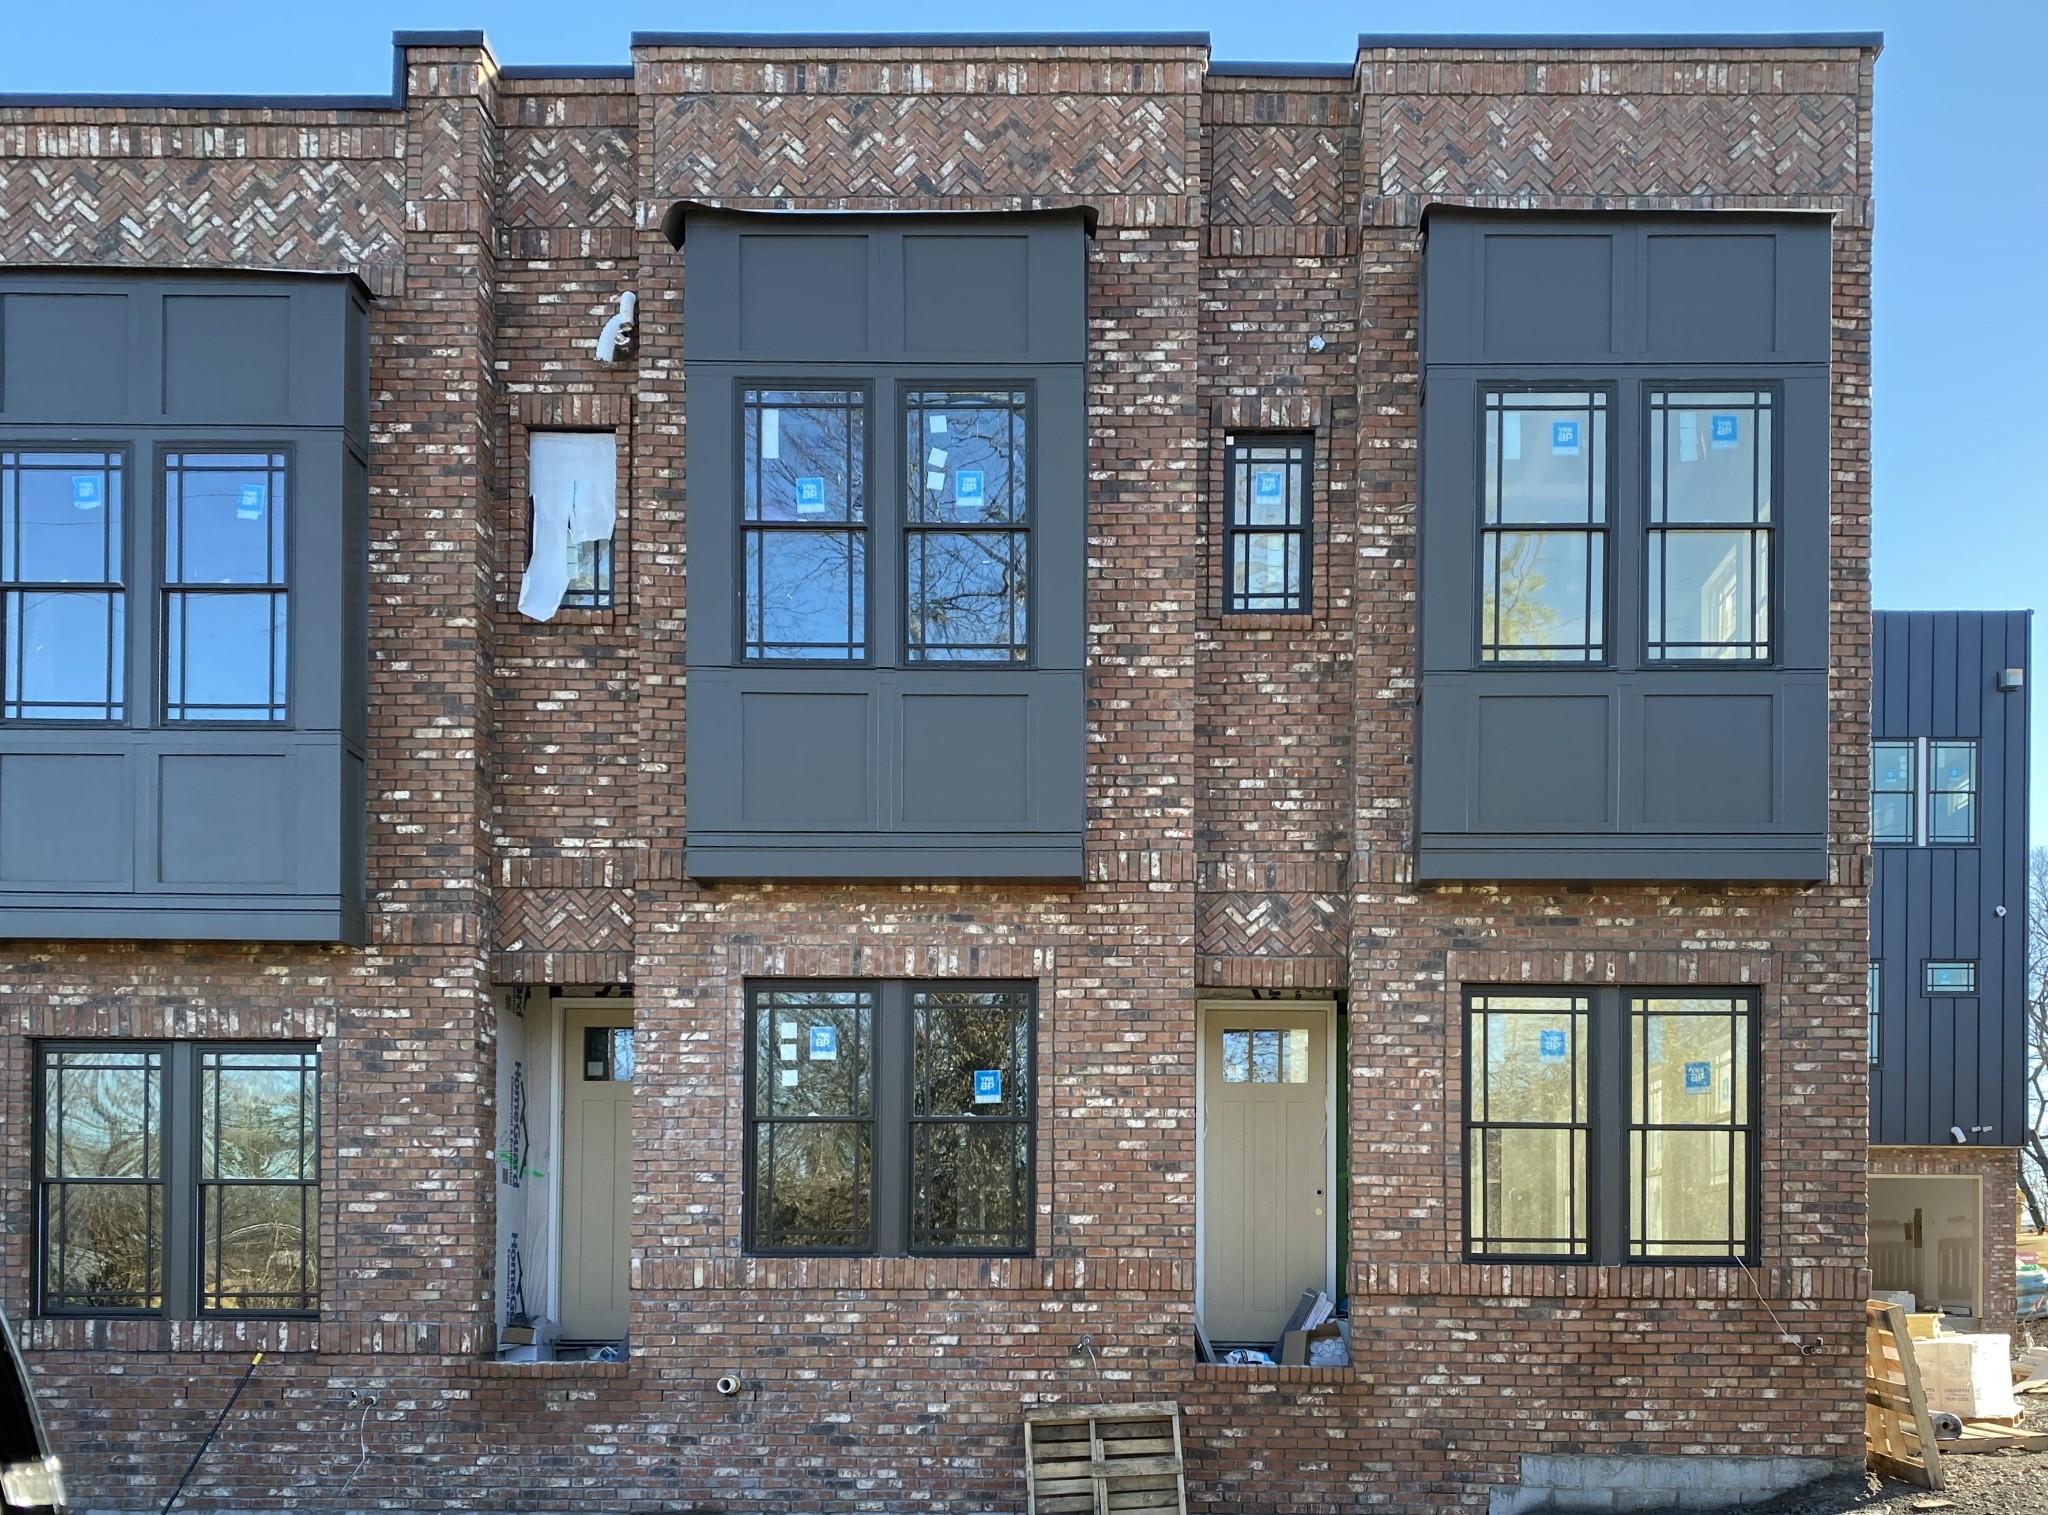 707 26th Ave N, Nashville, TN 37209 - Nashville, TN real estate listing